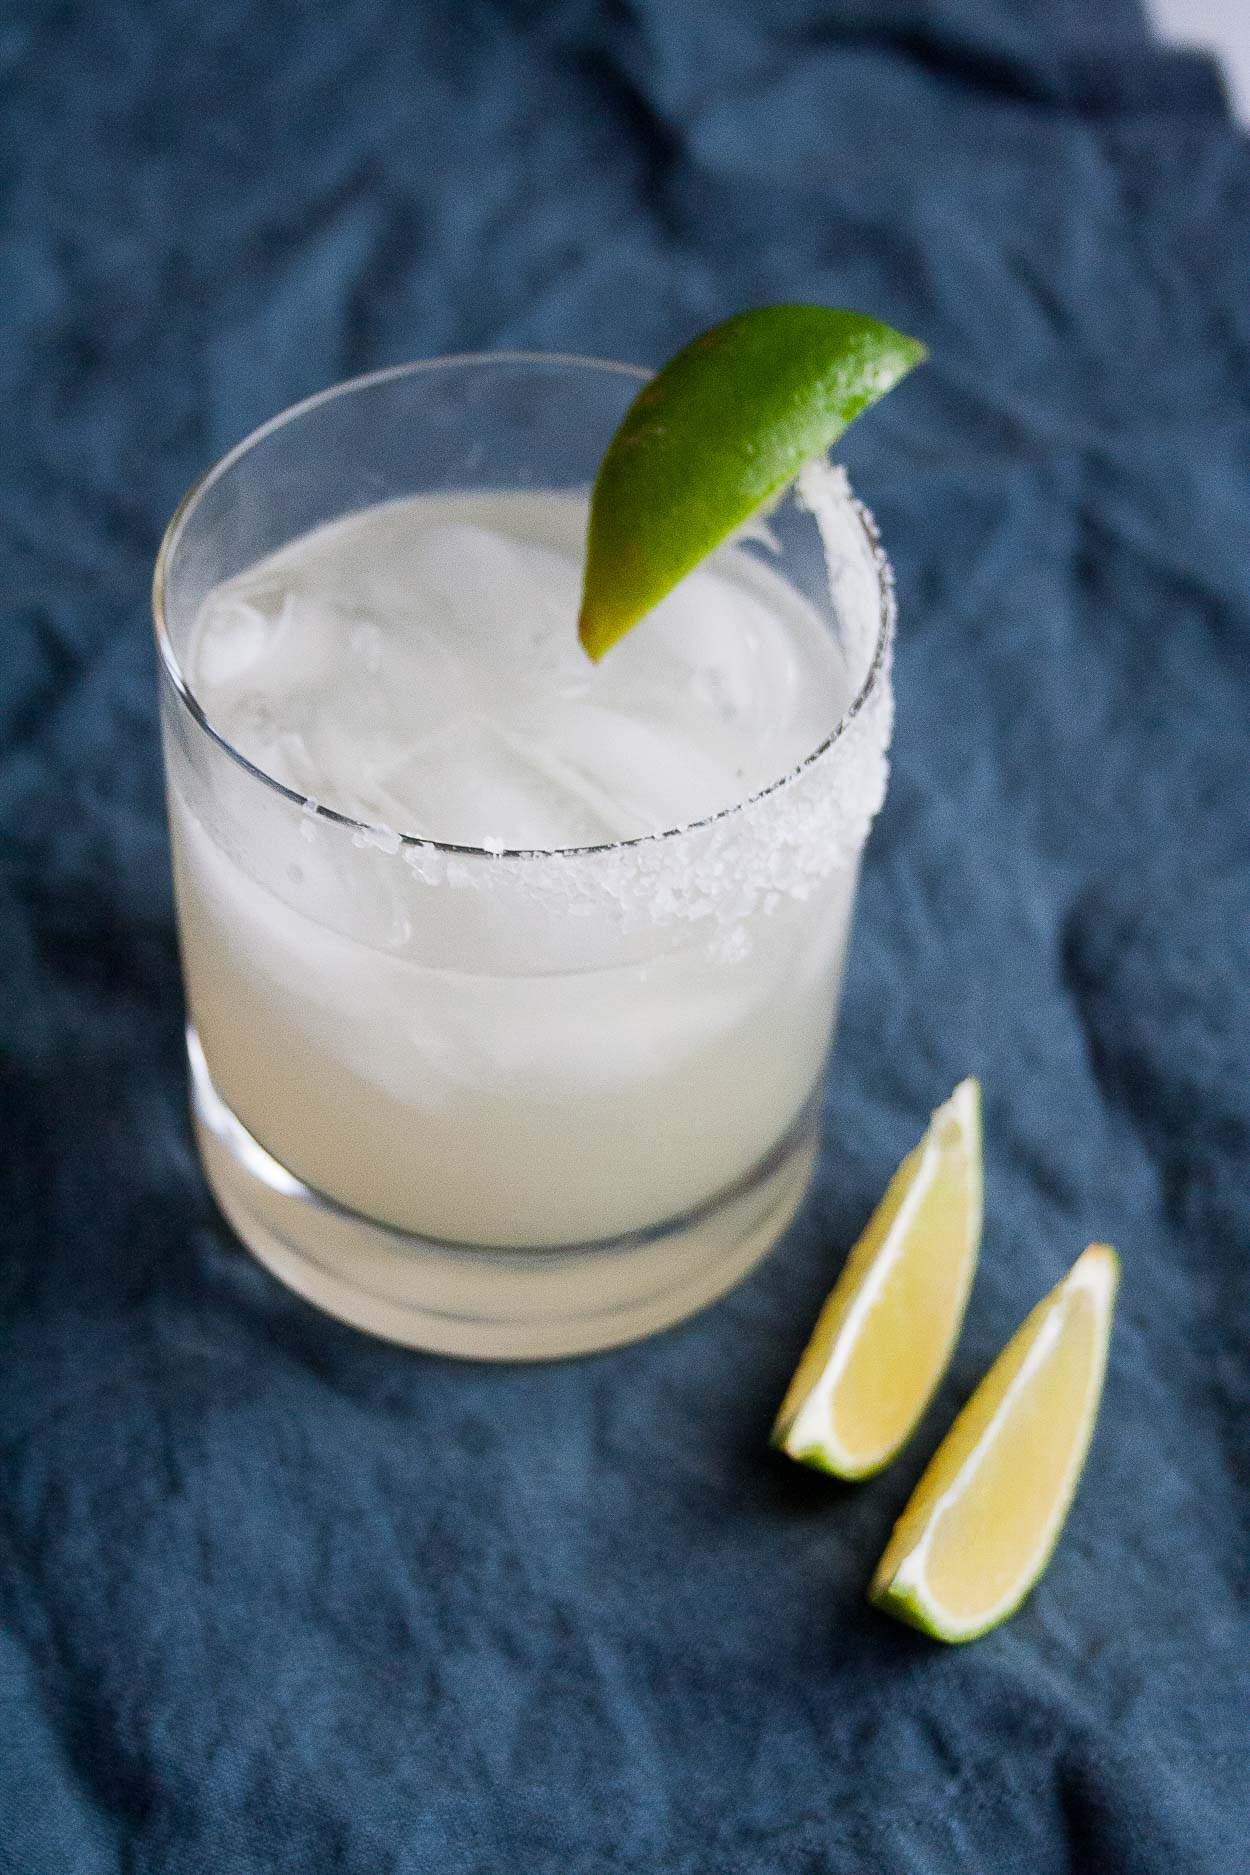 Lyrics & Libations // Smoky Paloma and In Da Club | paloma recipe, cocktail, drink, mezcal, tequila, easy, grapefruit, birthday | hungrybynature.com